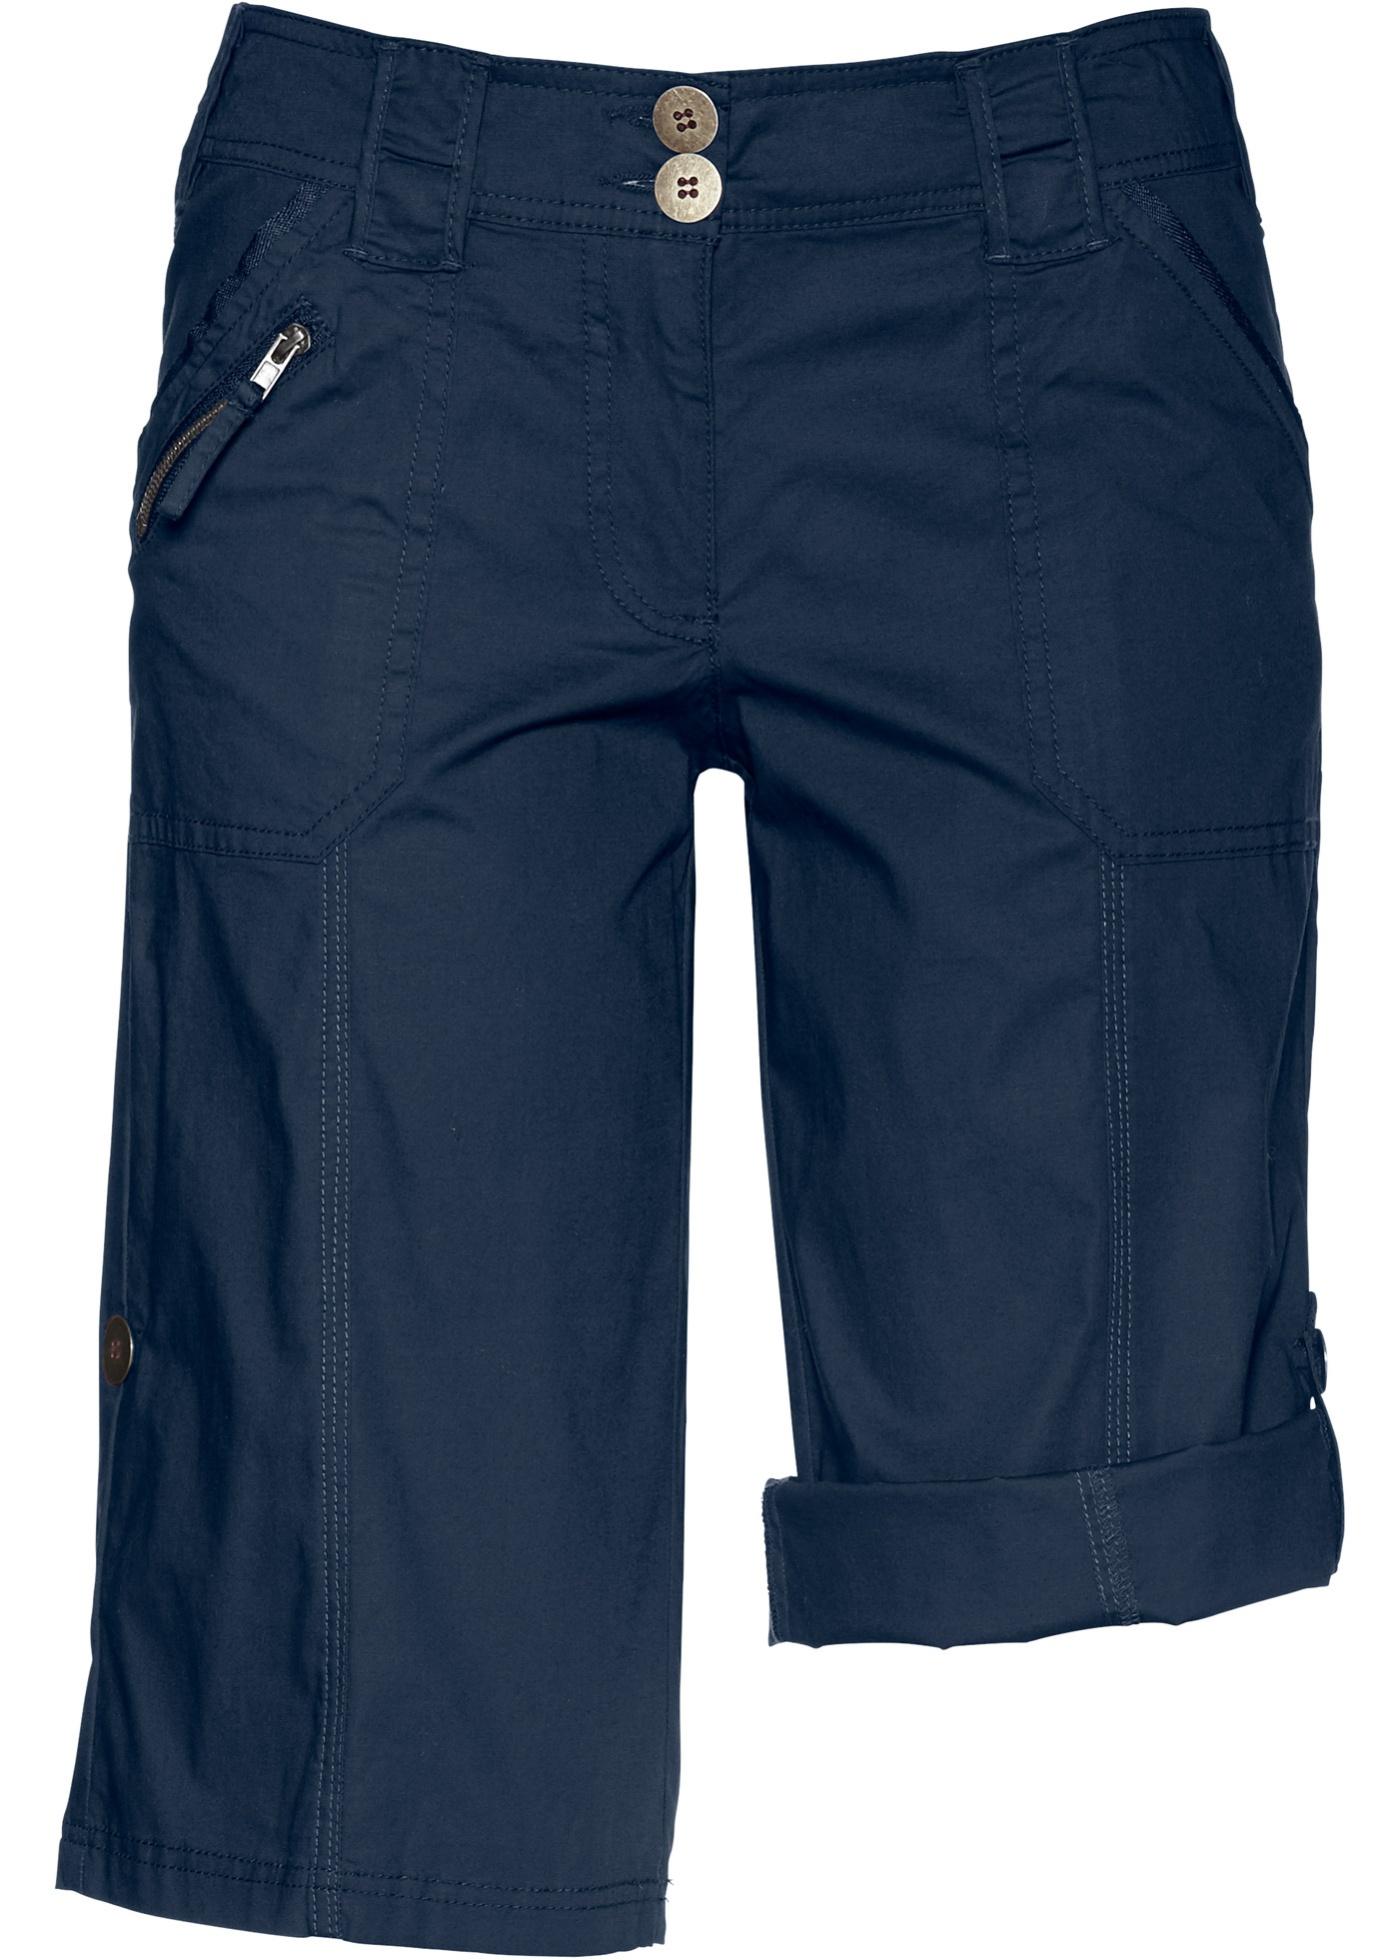 Hosen - Bermuda mit krempelbaren Beinen › bonprix › blau  - Onlineshop Bonprix